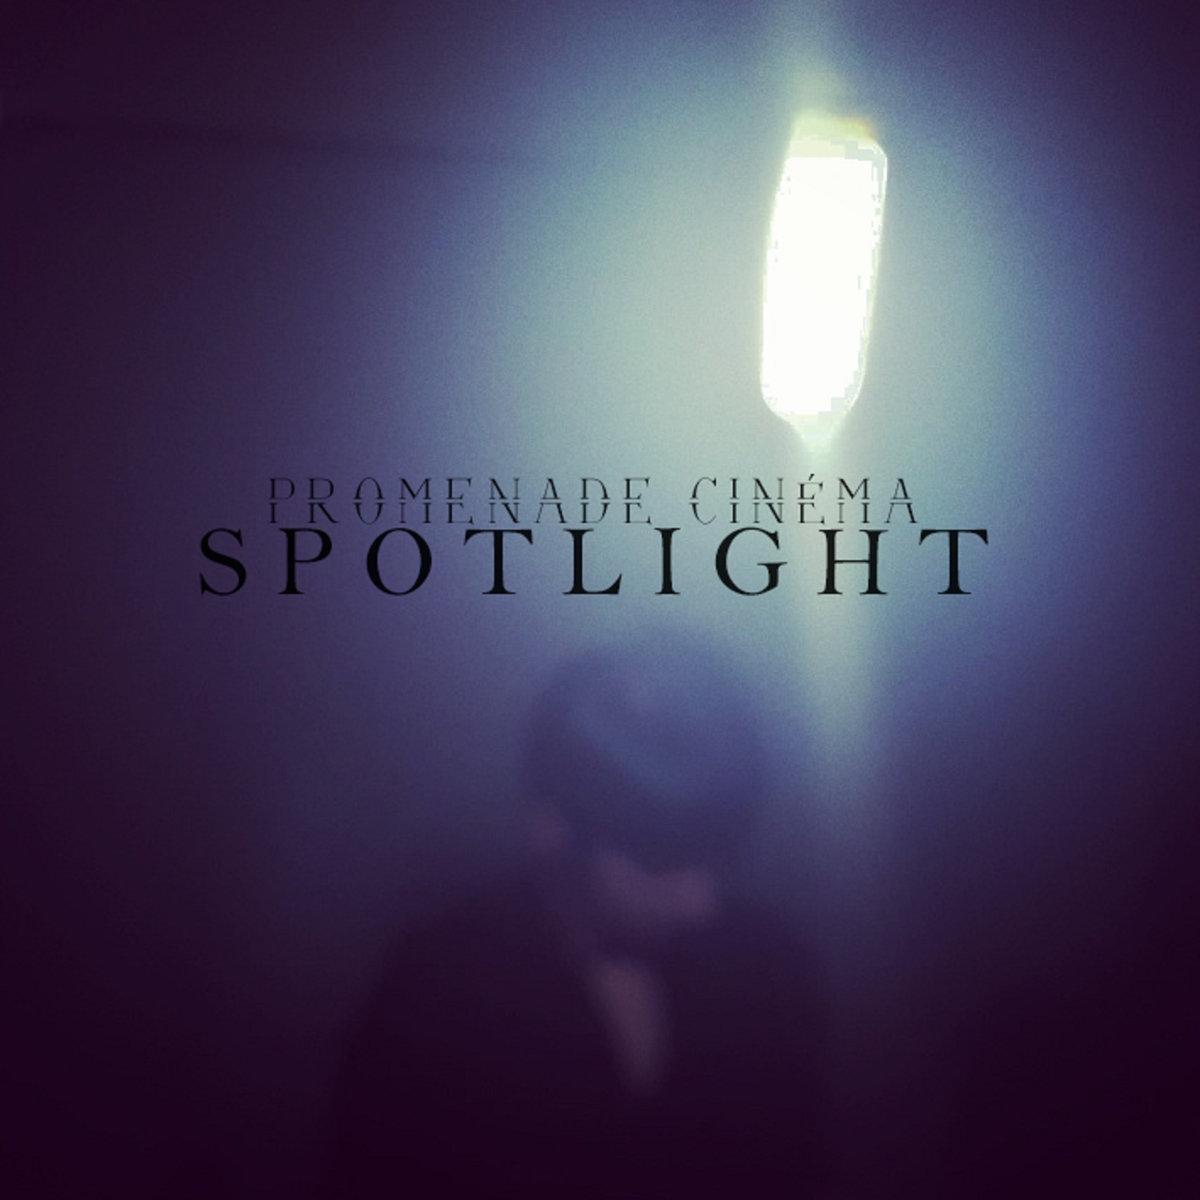 Promenade Cinema, Spotlight